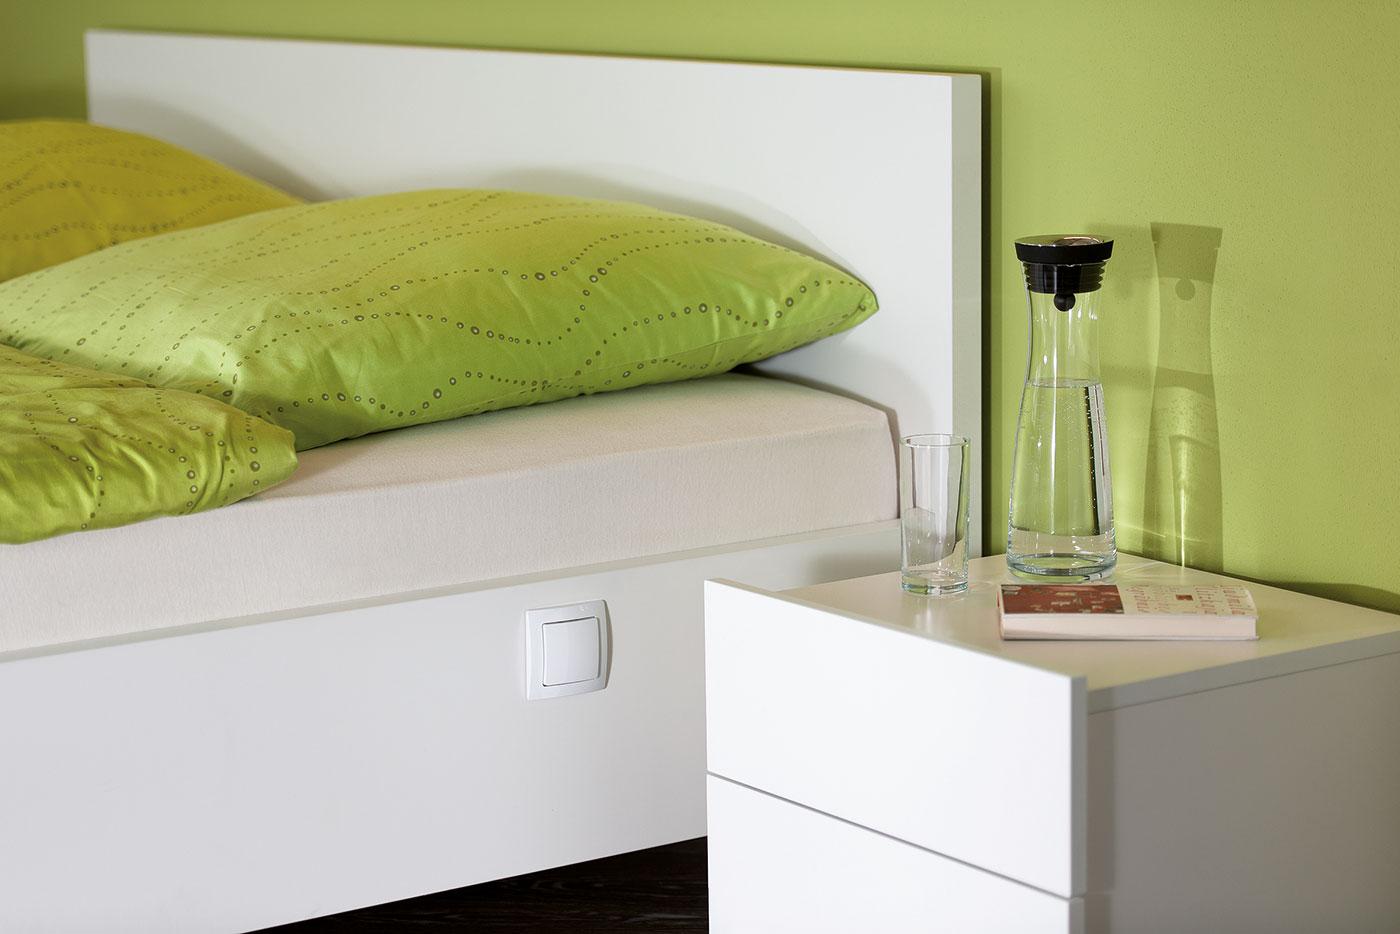 ausprobiert philips hue per devolo home control steuern. Black Bedroom Furniture Sets. Home Design Ideas